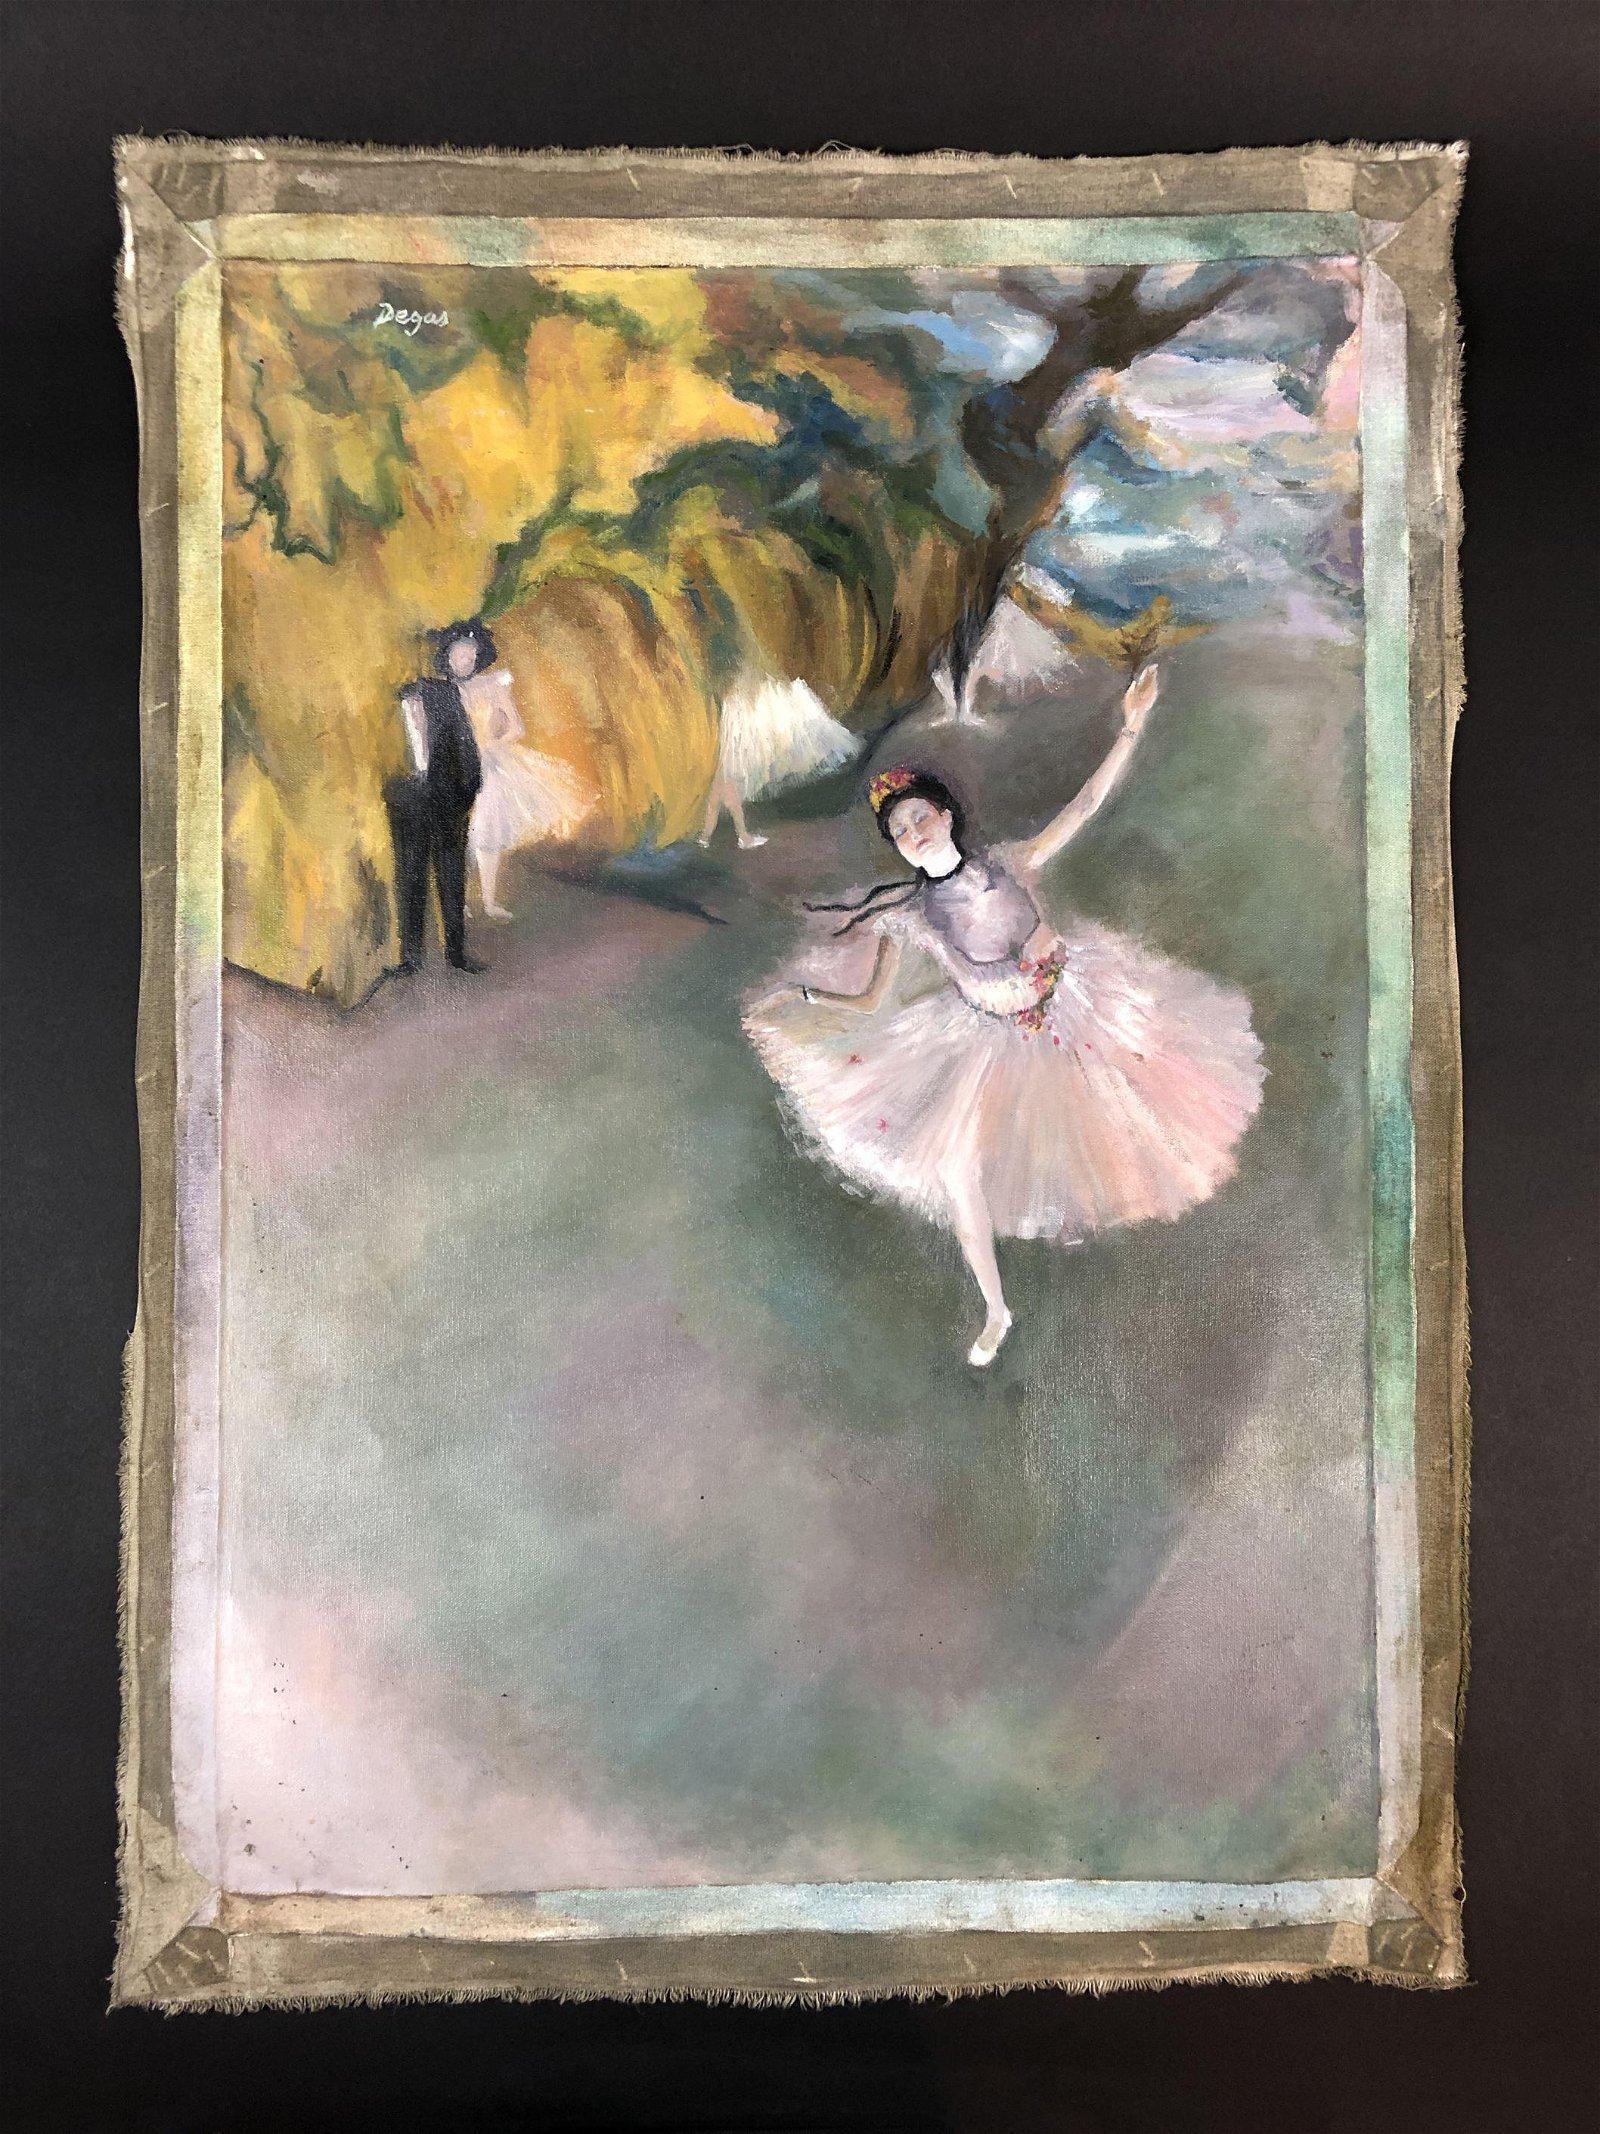 Edgar Degas (French, 1834-1917) - Oil on Canvas